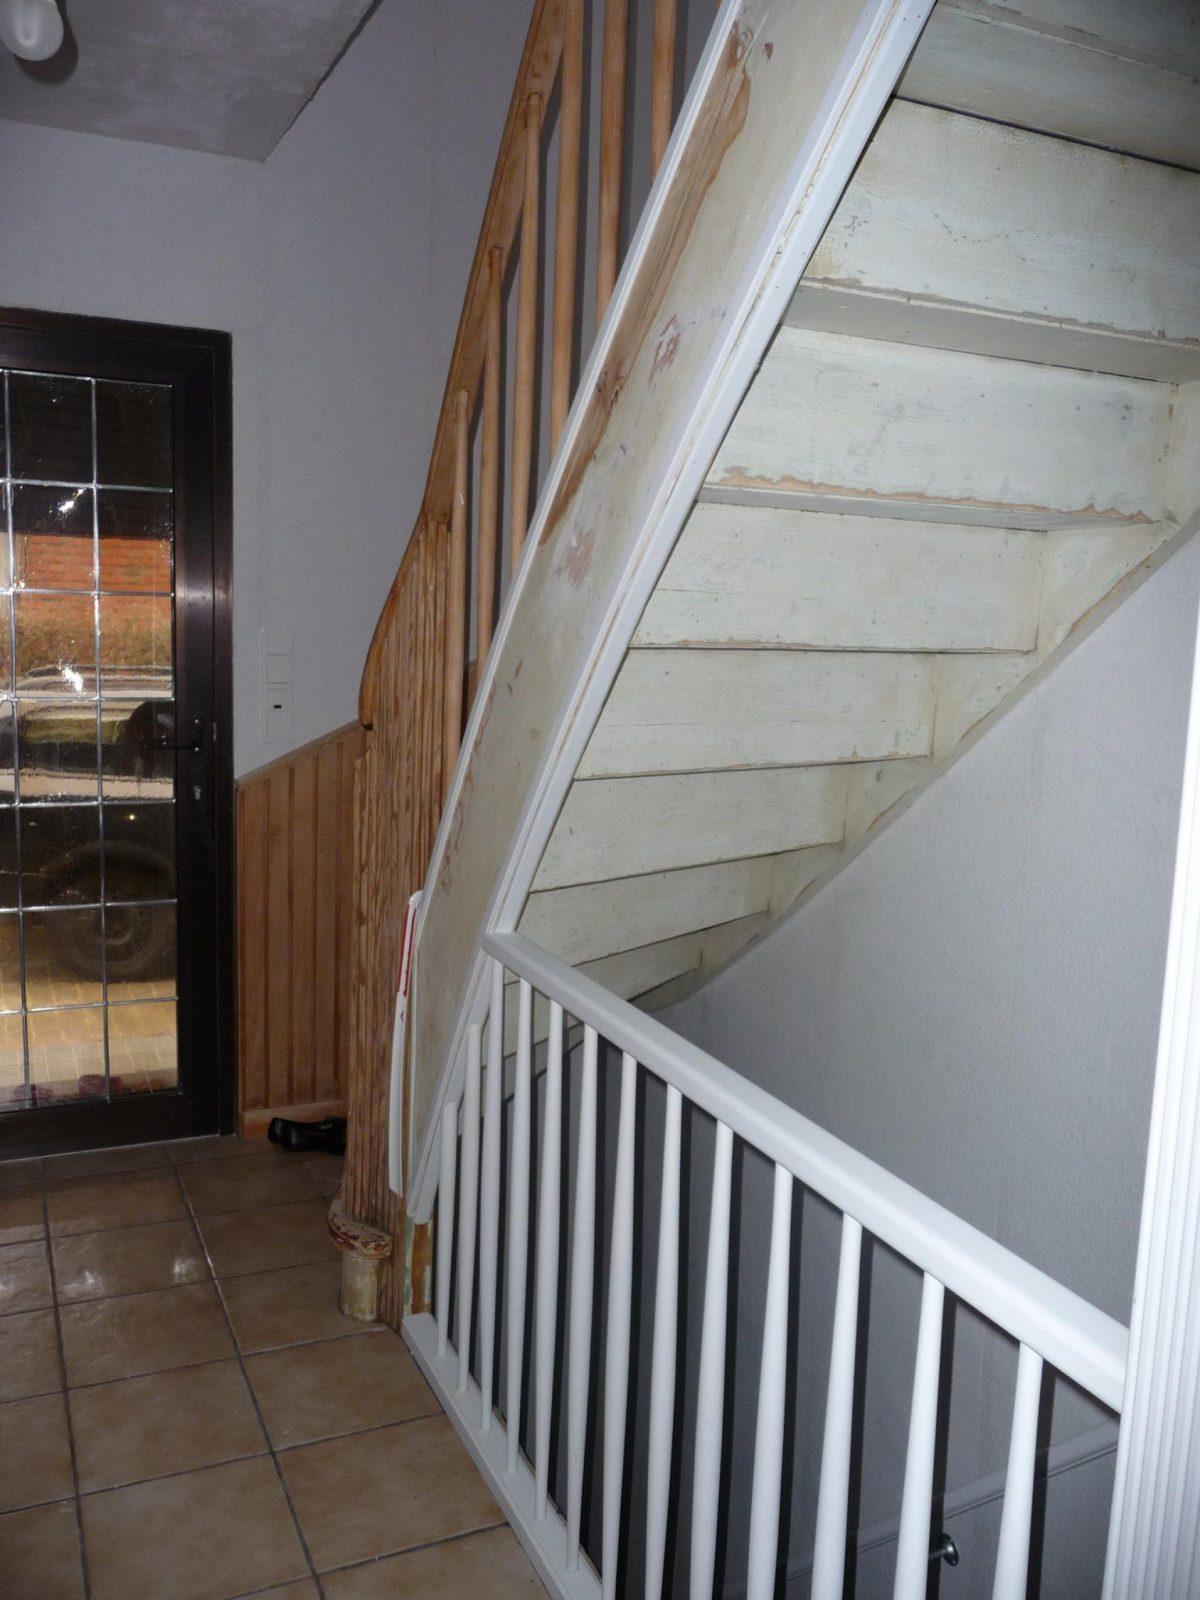 wunderbar holztreppe streichen welche farbe treppe streichen frisch von treppe streichen welche. Black Bedroom Furniture Sets. Home Design Ideas